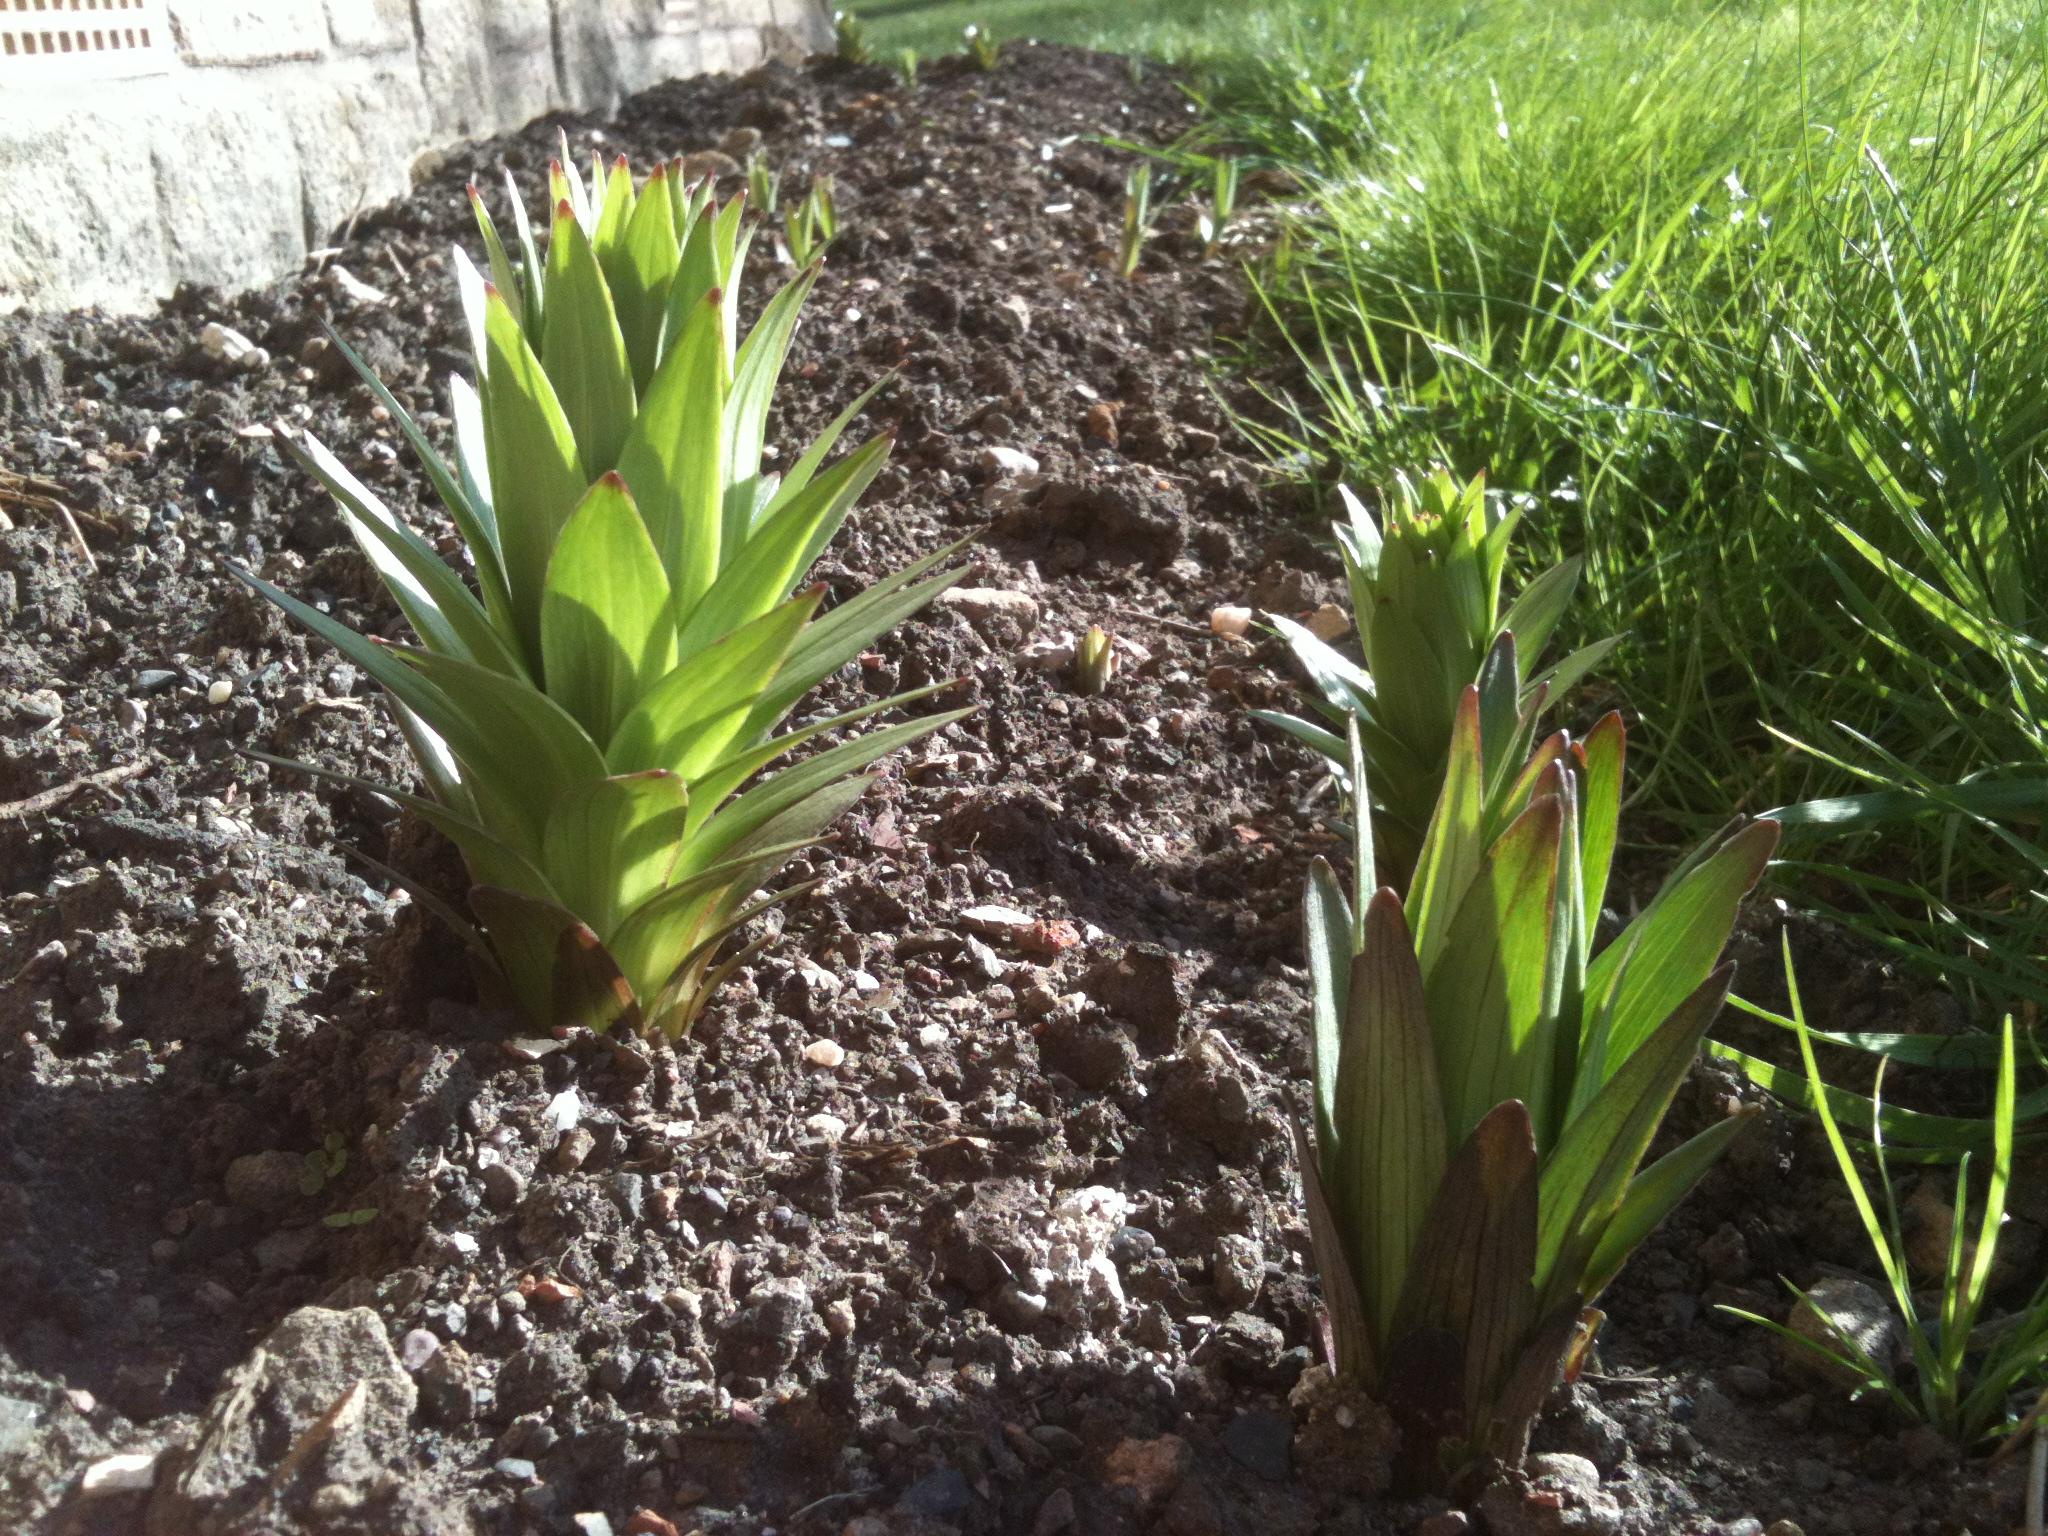 Dahlia gardeningforlawyers dahlias or pineapples izmirmasajfo